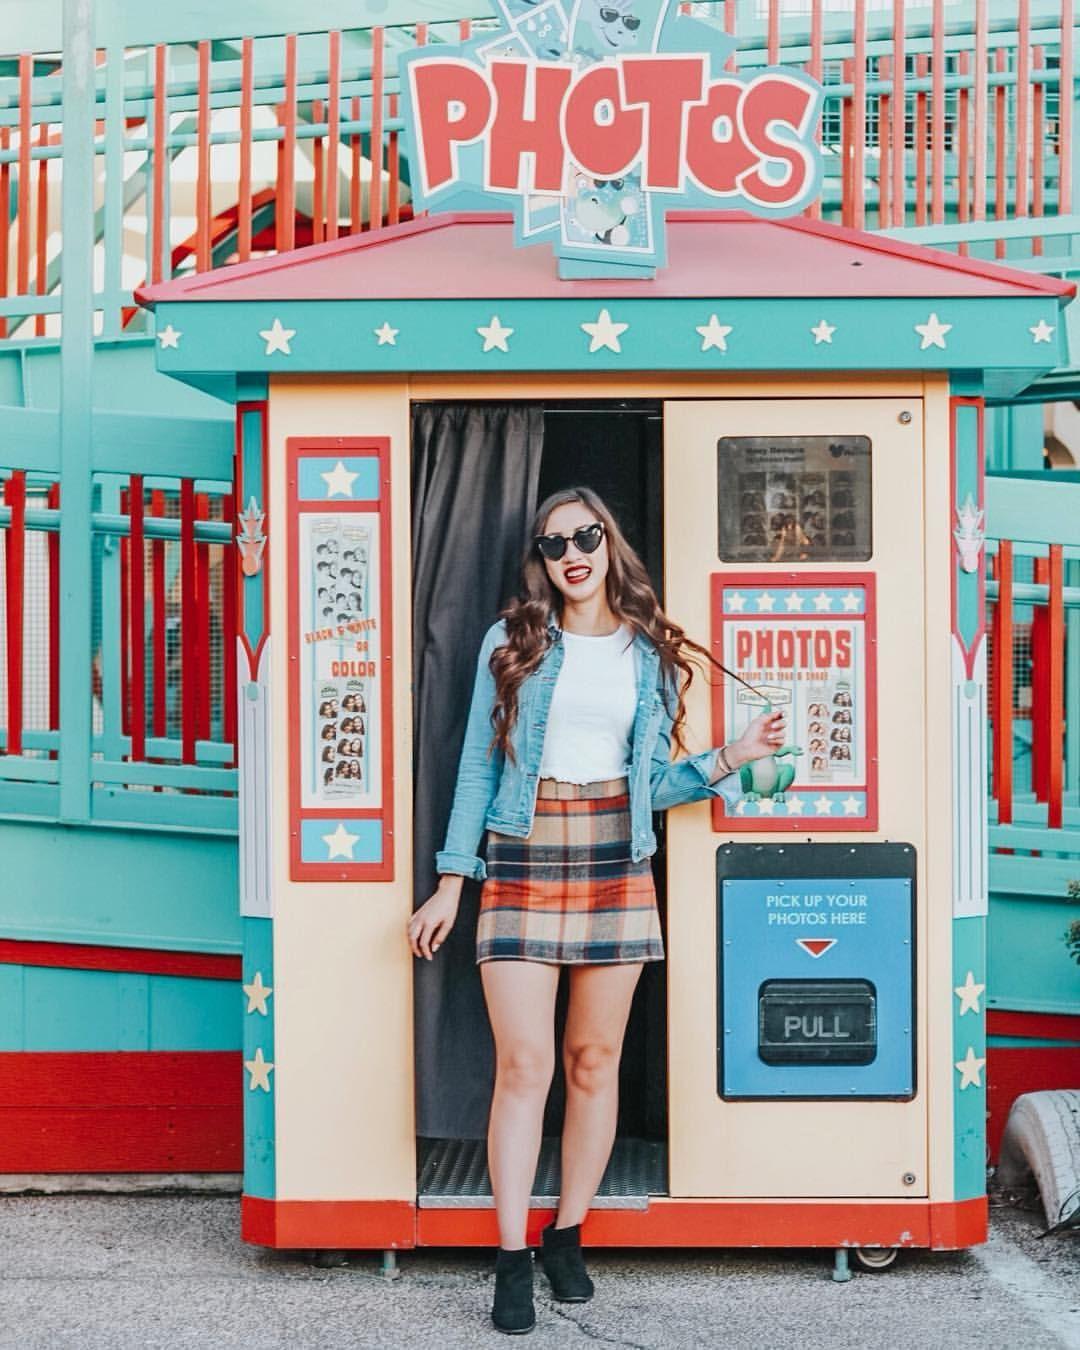 e5600c7b2 Lulu's Mad for Plaid Beige Plaid Mini Skirt. Disney's Animal Kingdom. Fair  Carnival photo booth. Instagram @abcdefgina